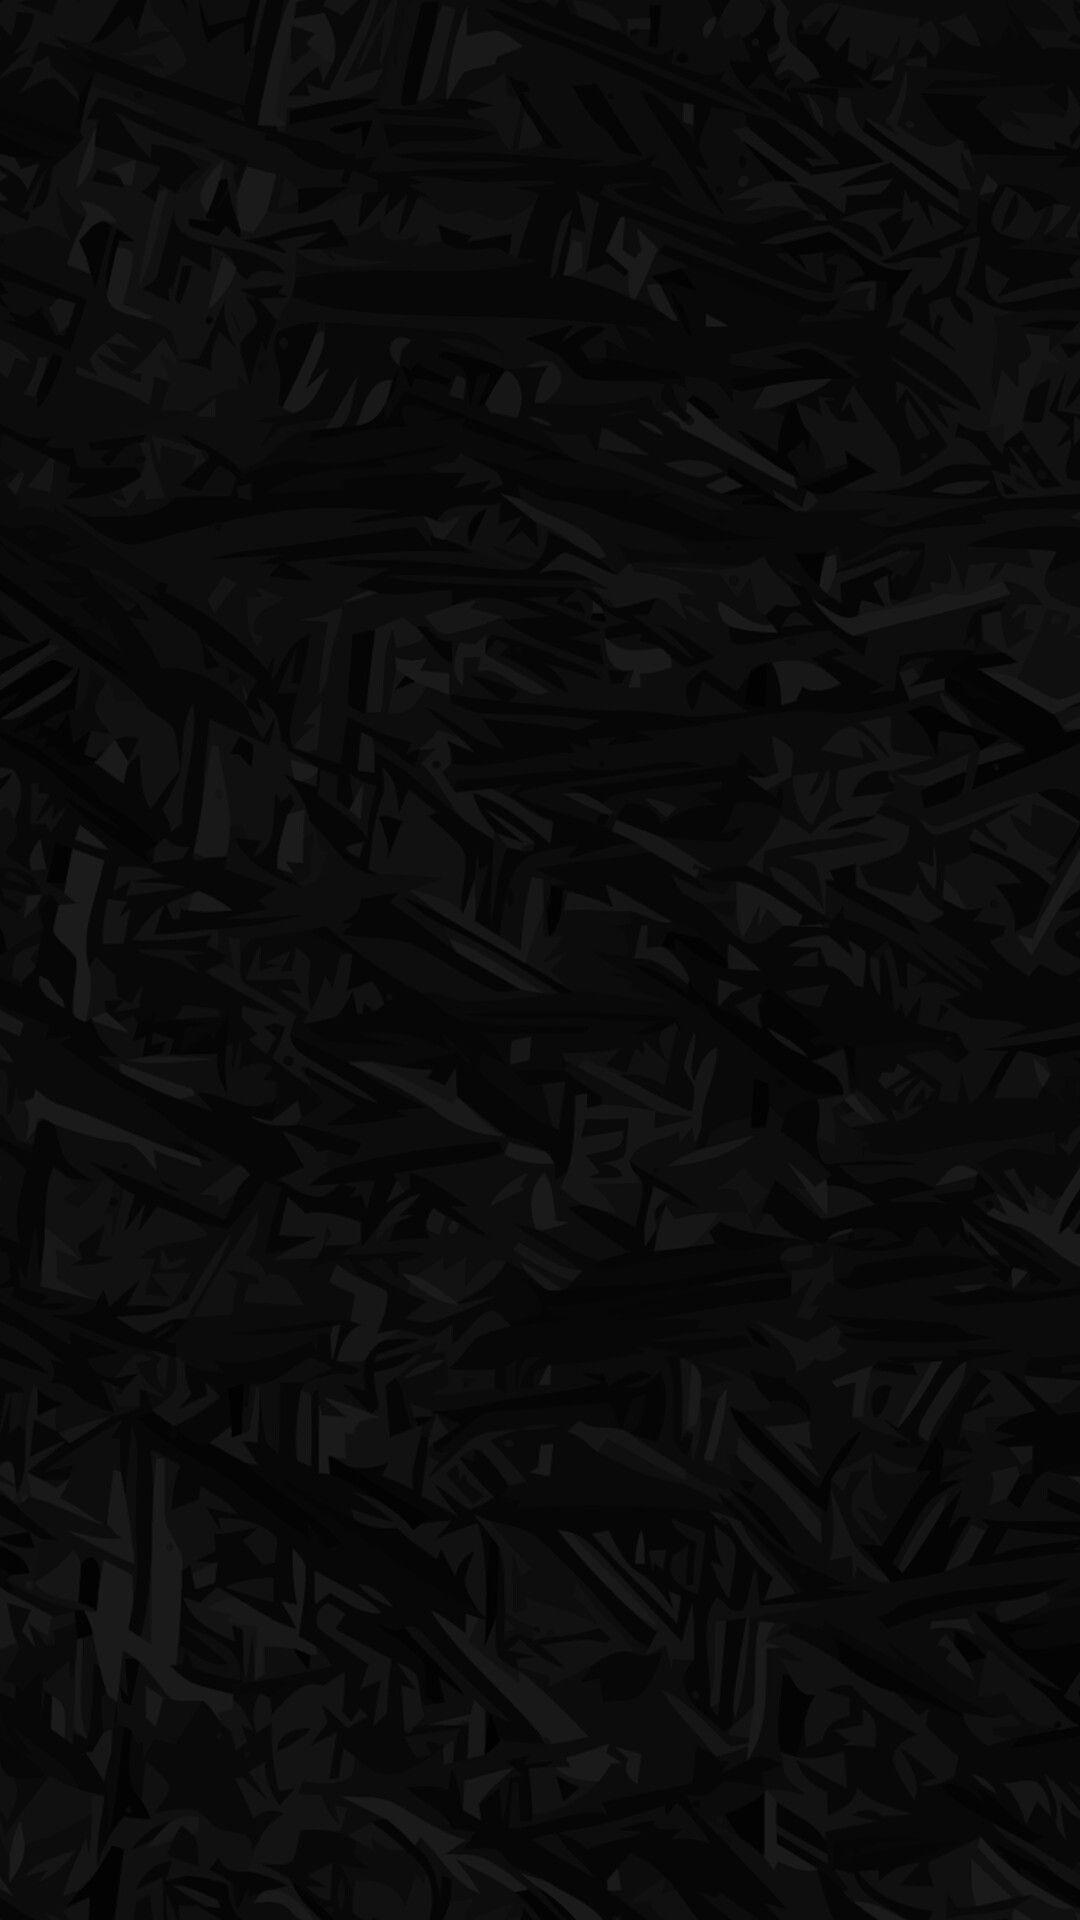 Wallpaper Of Dark Background #wallpaper #background #dark | Camoflauge  Wallpaper, Black Phone Wallpaper, Camouflage Wallpaper